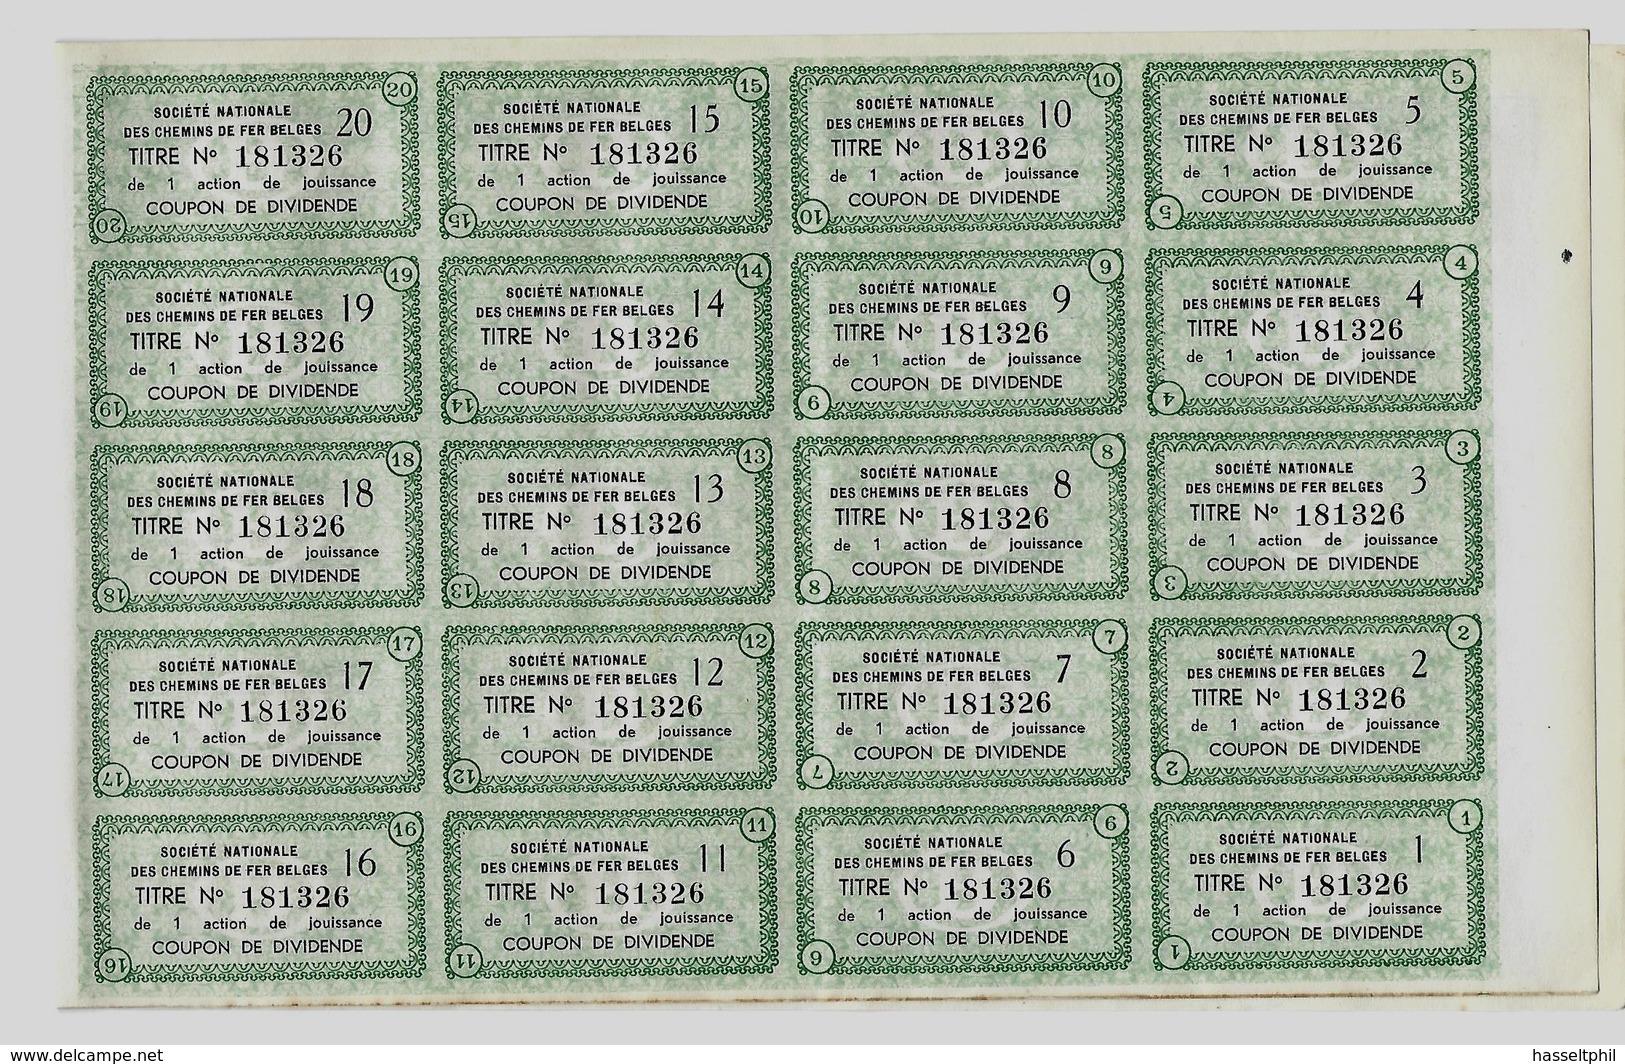 NMBS - 1 Winstaandeel - Brussel 1 September 1937 - Groen - Chemin De Fer & Tramway